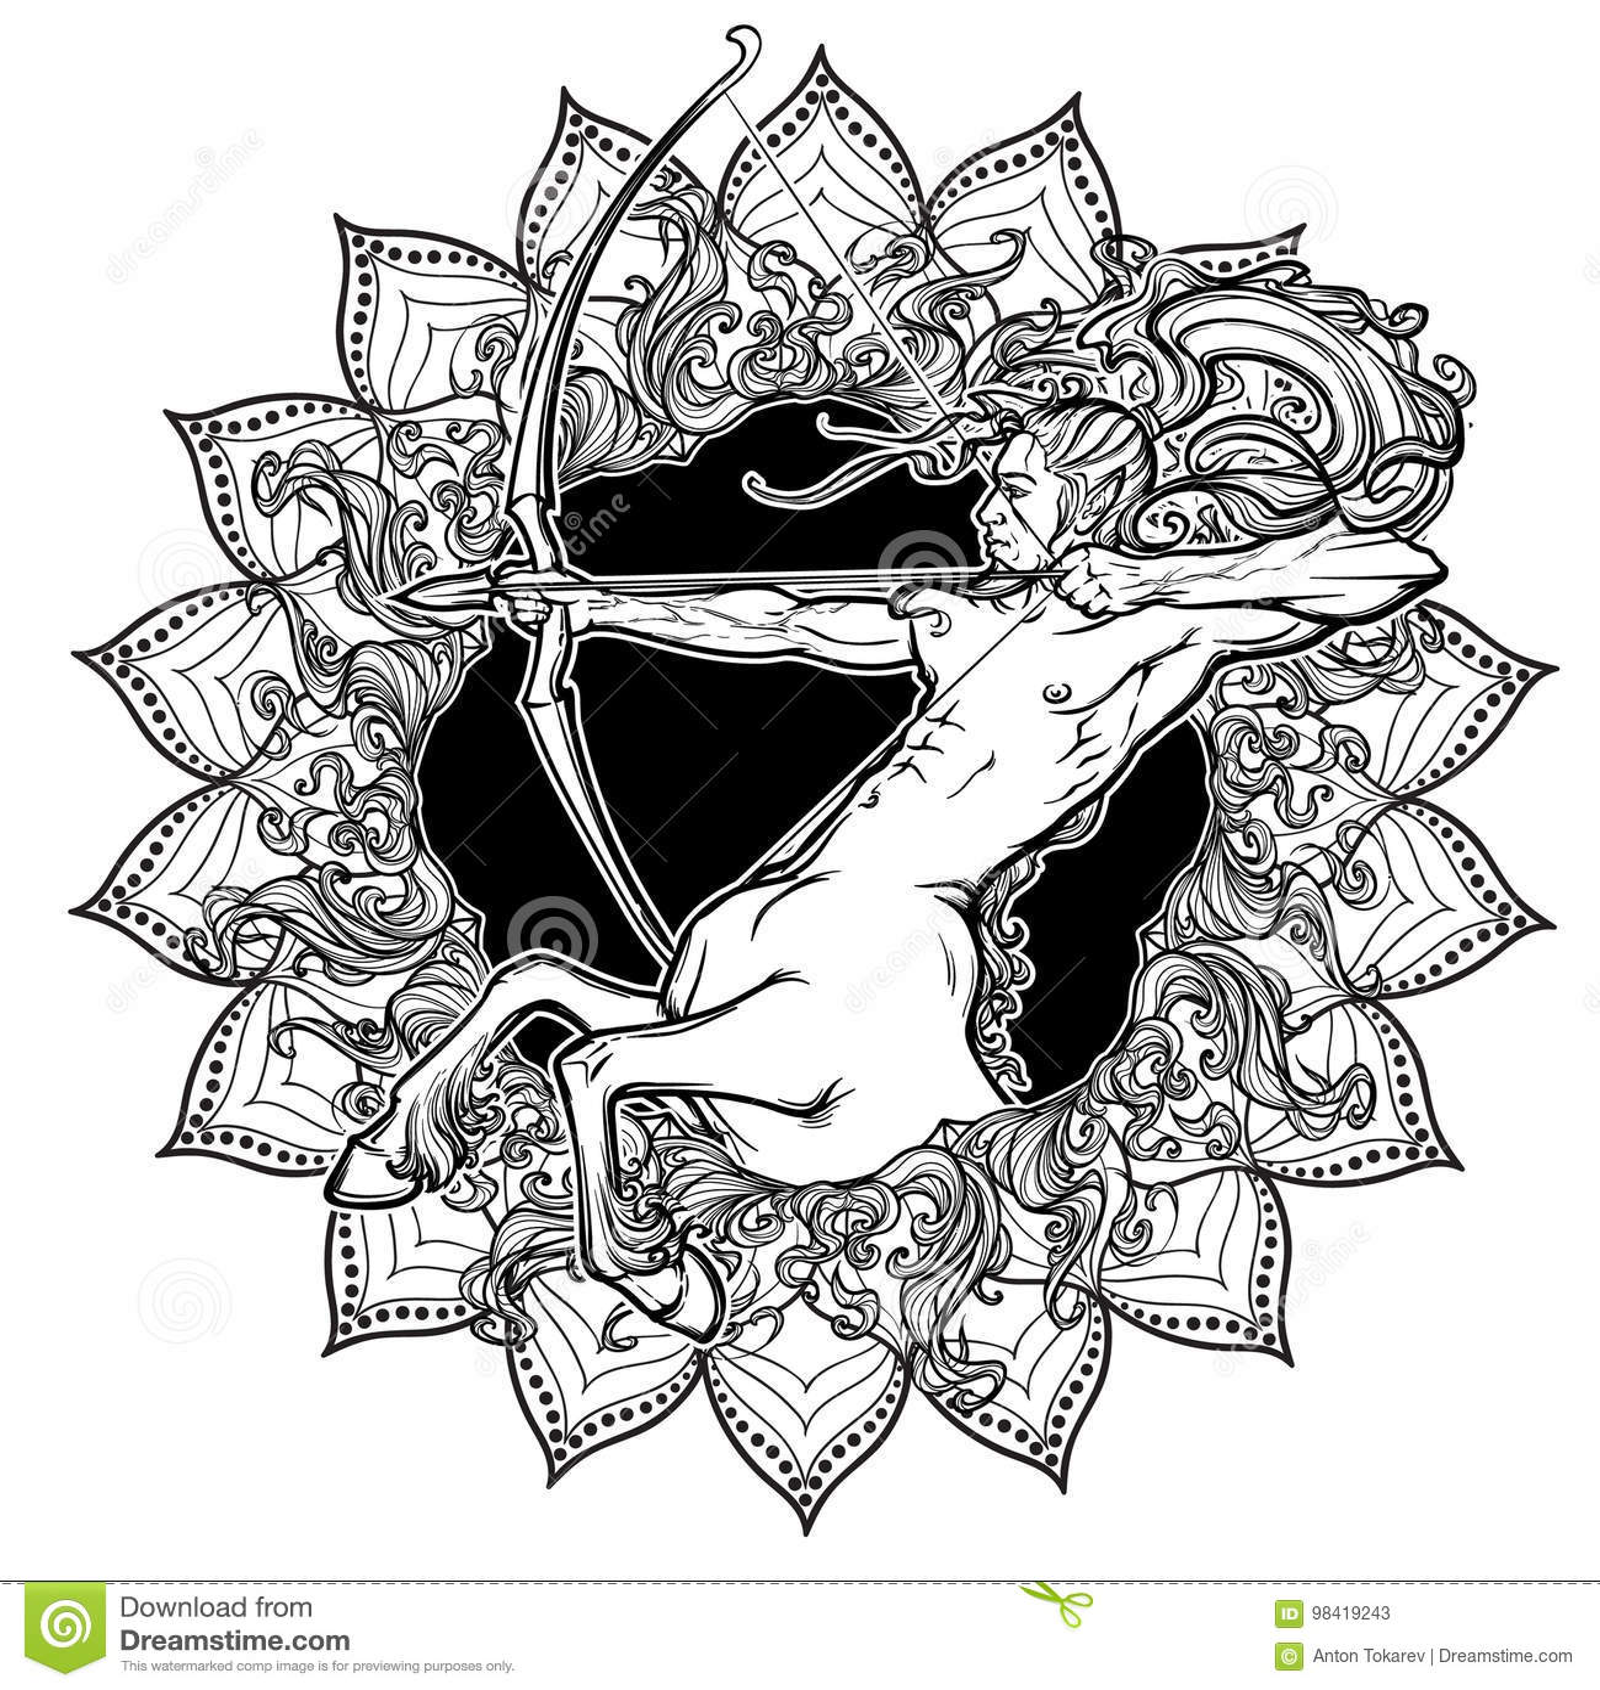 Sagittarius Zodiac Sign With A Decorative Frame Of Sun